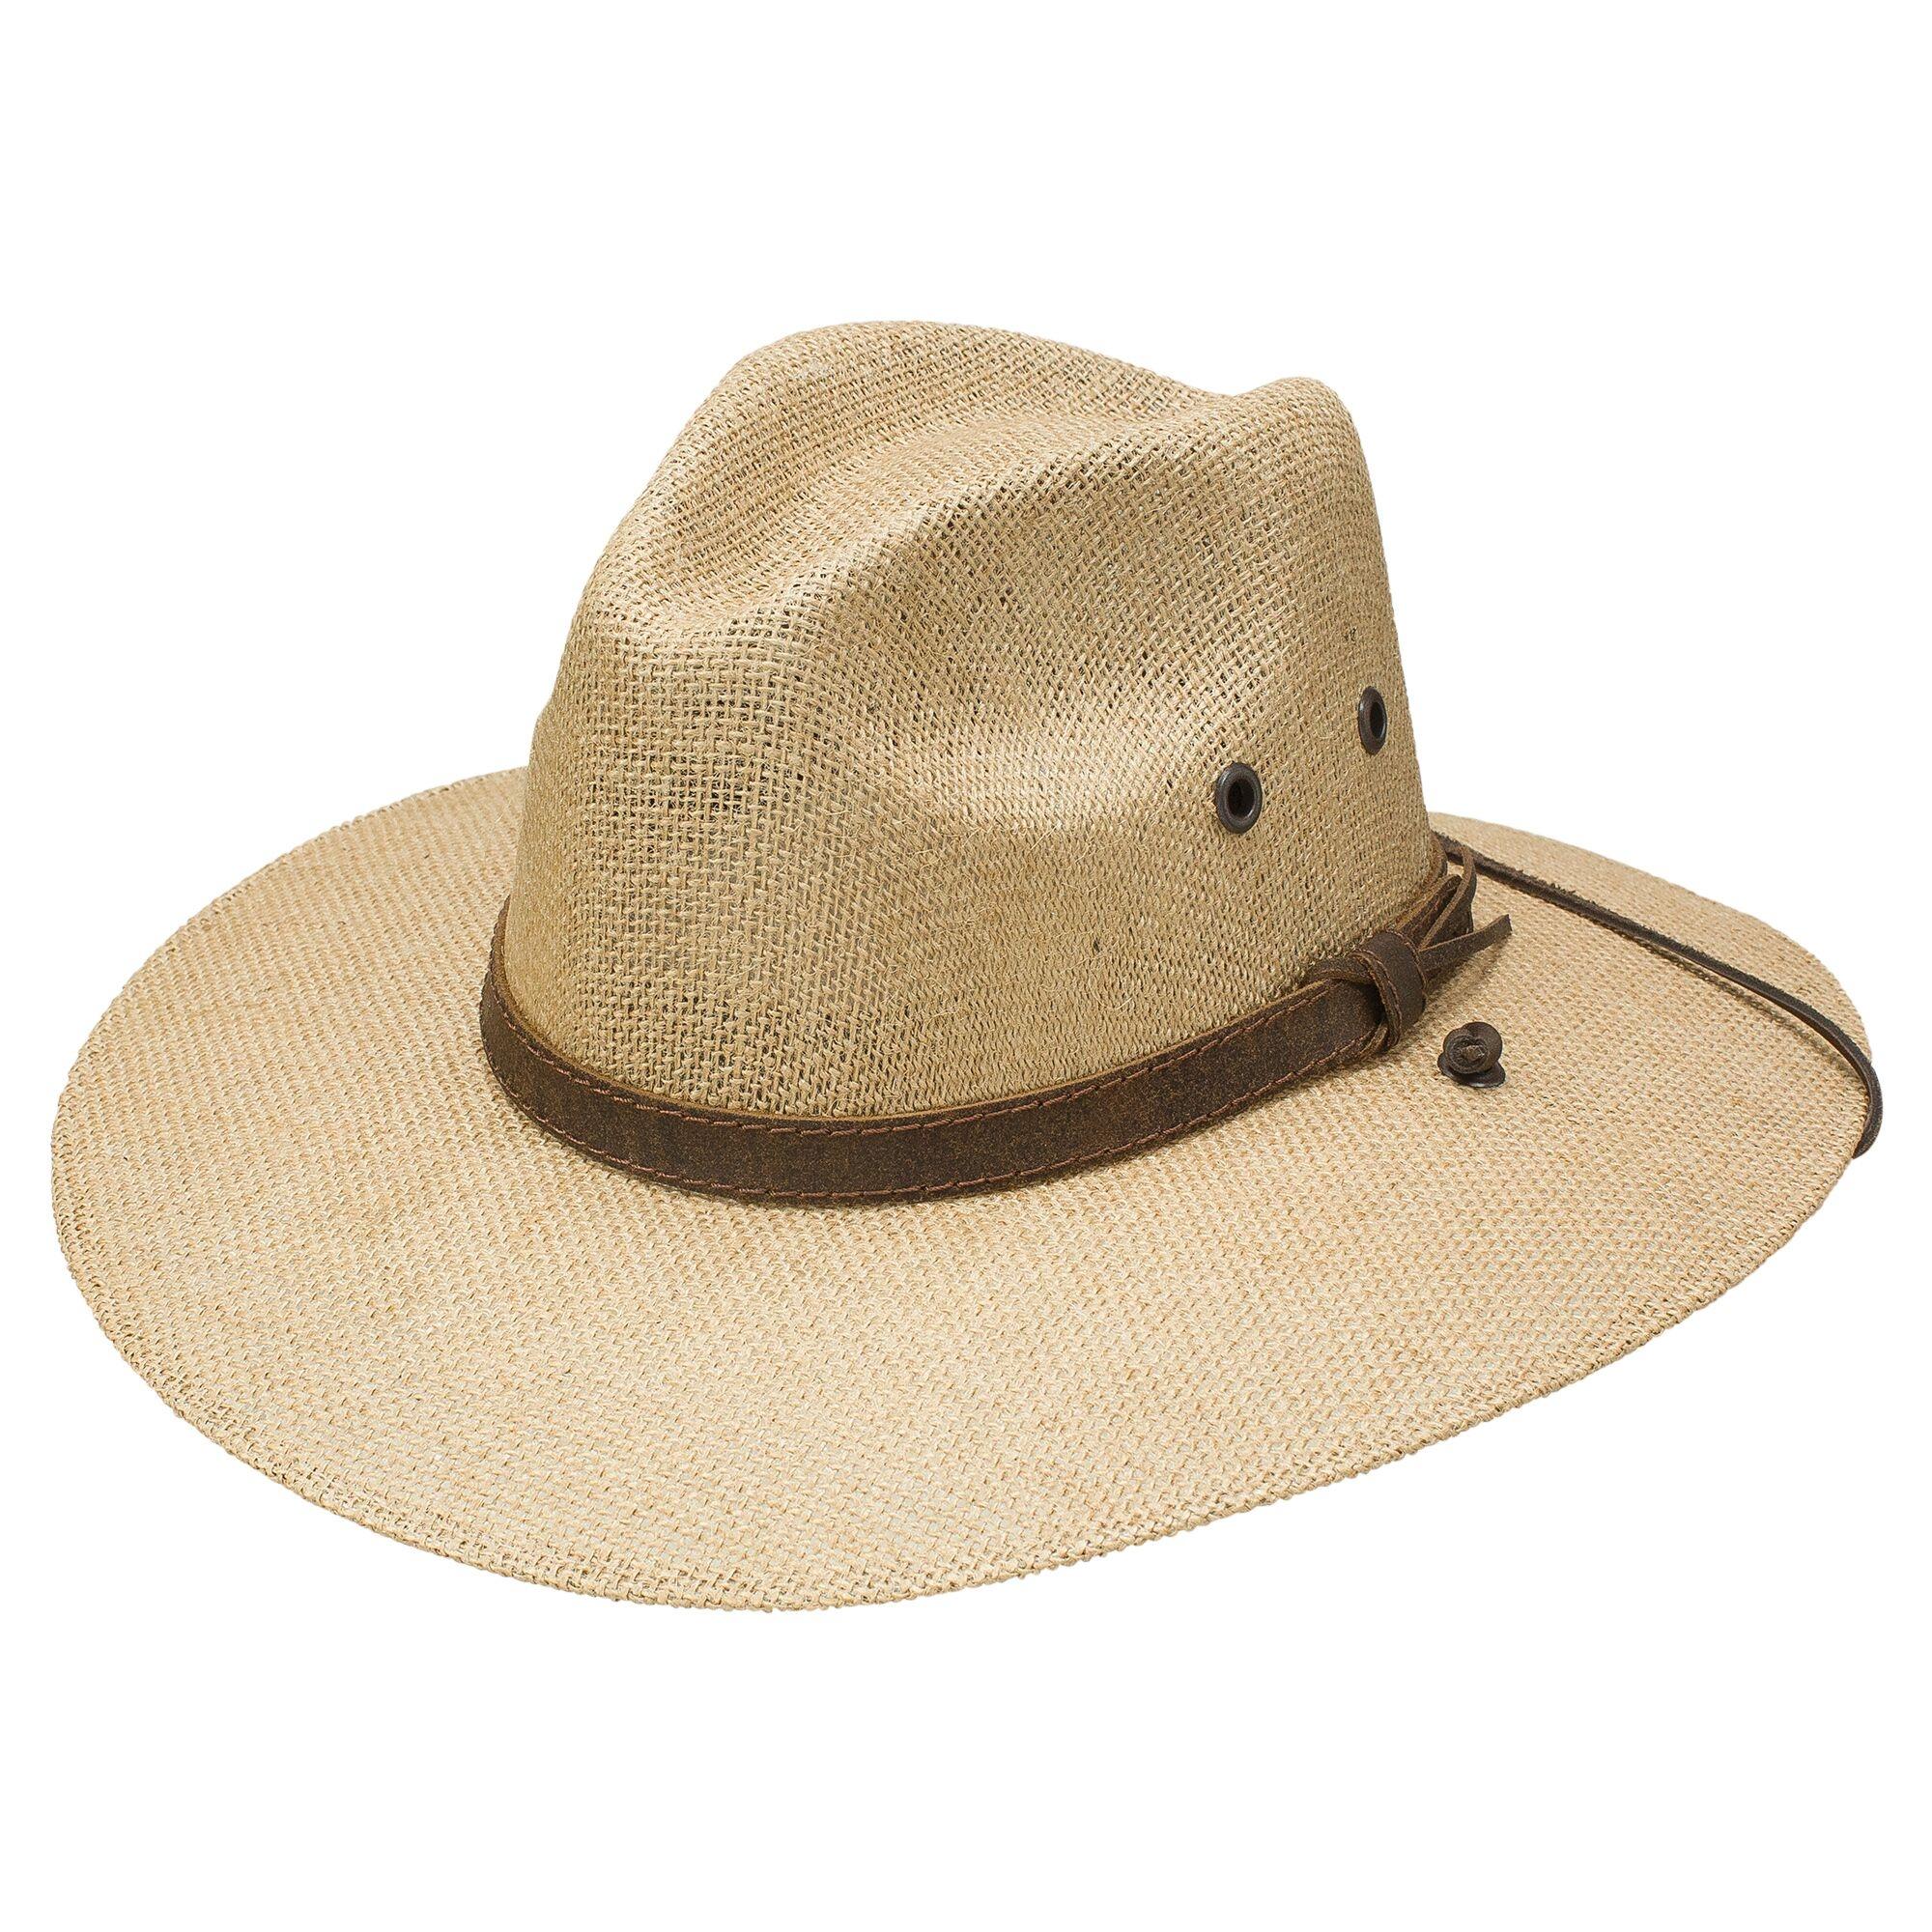 Stetson Fazenda - Straw Cowboy Hat